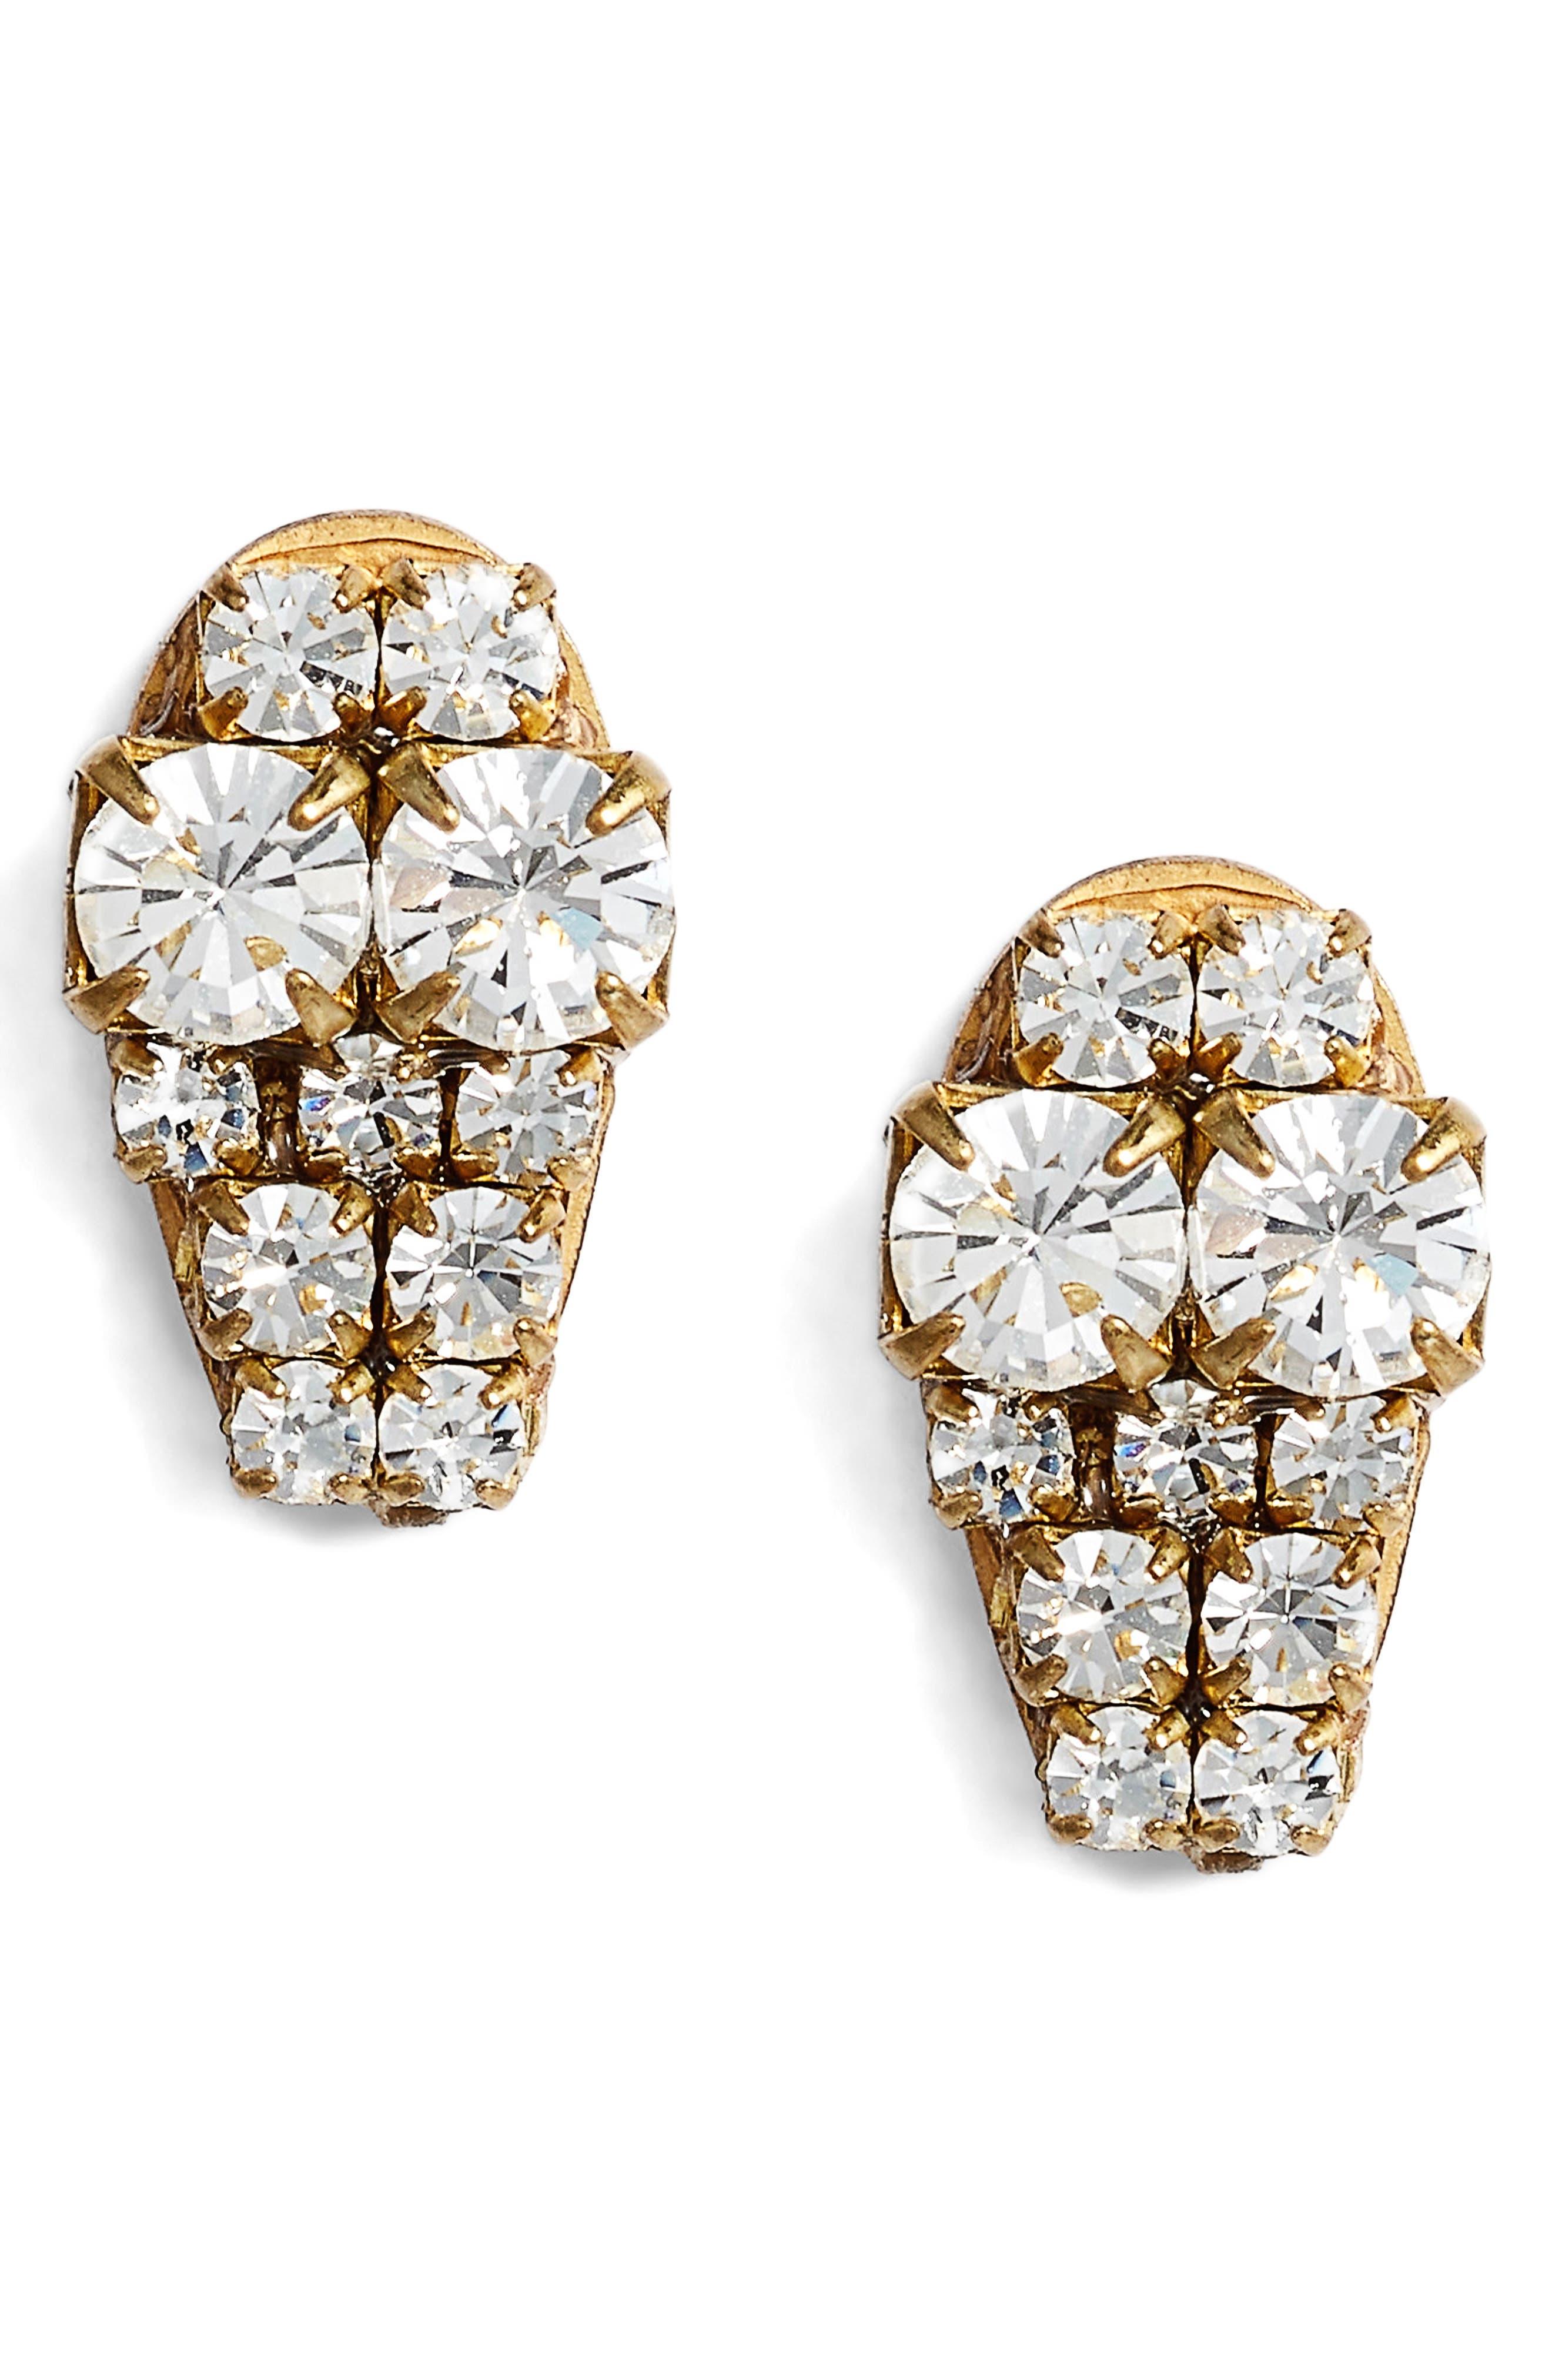 Graduated Crystal Stud Earrings,                             Main thumbnail 1, color,                             Crystal/ Gold